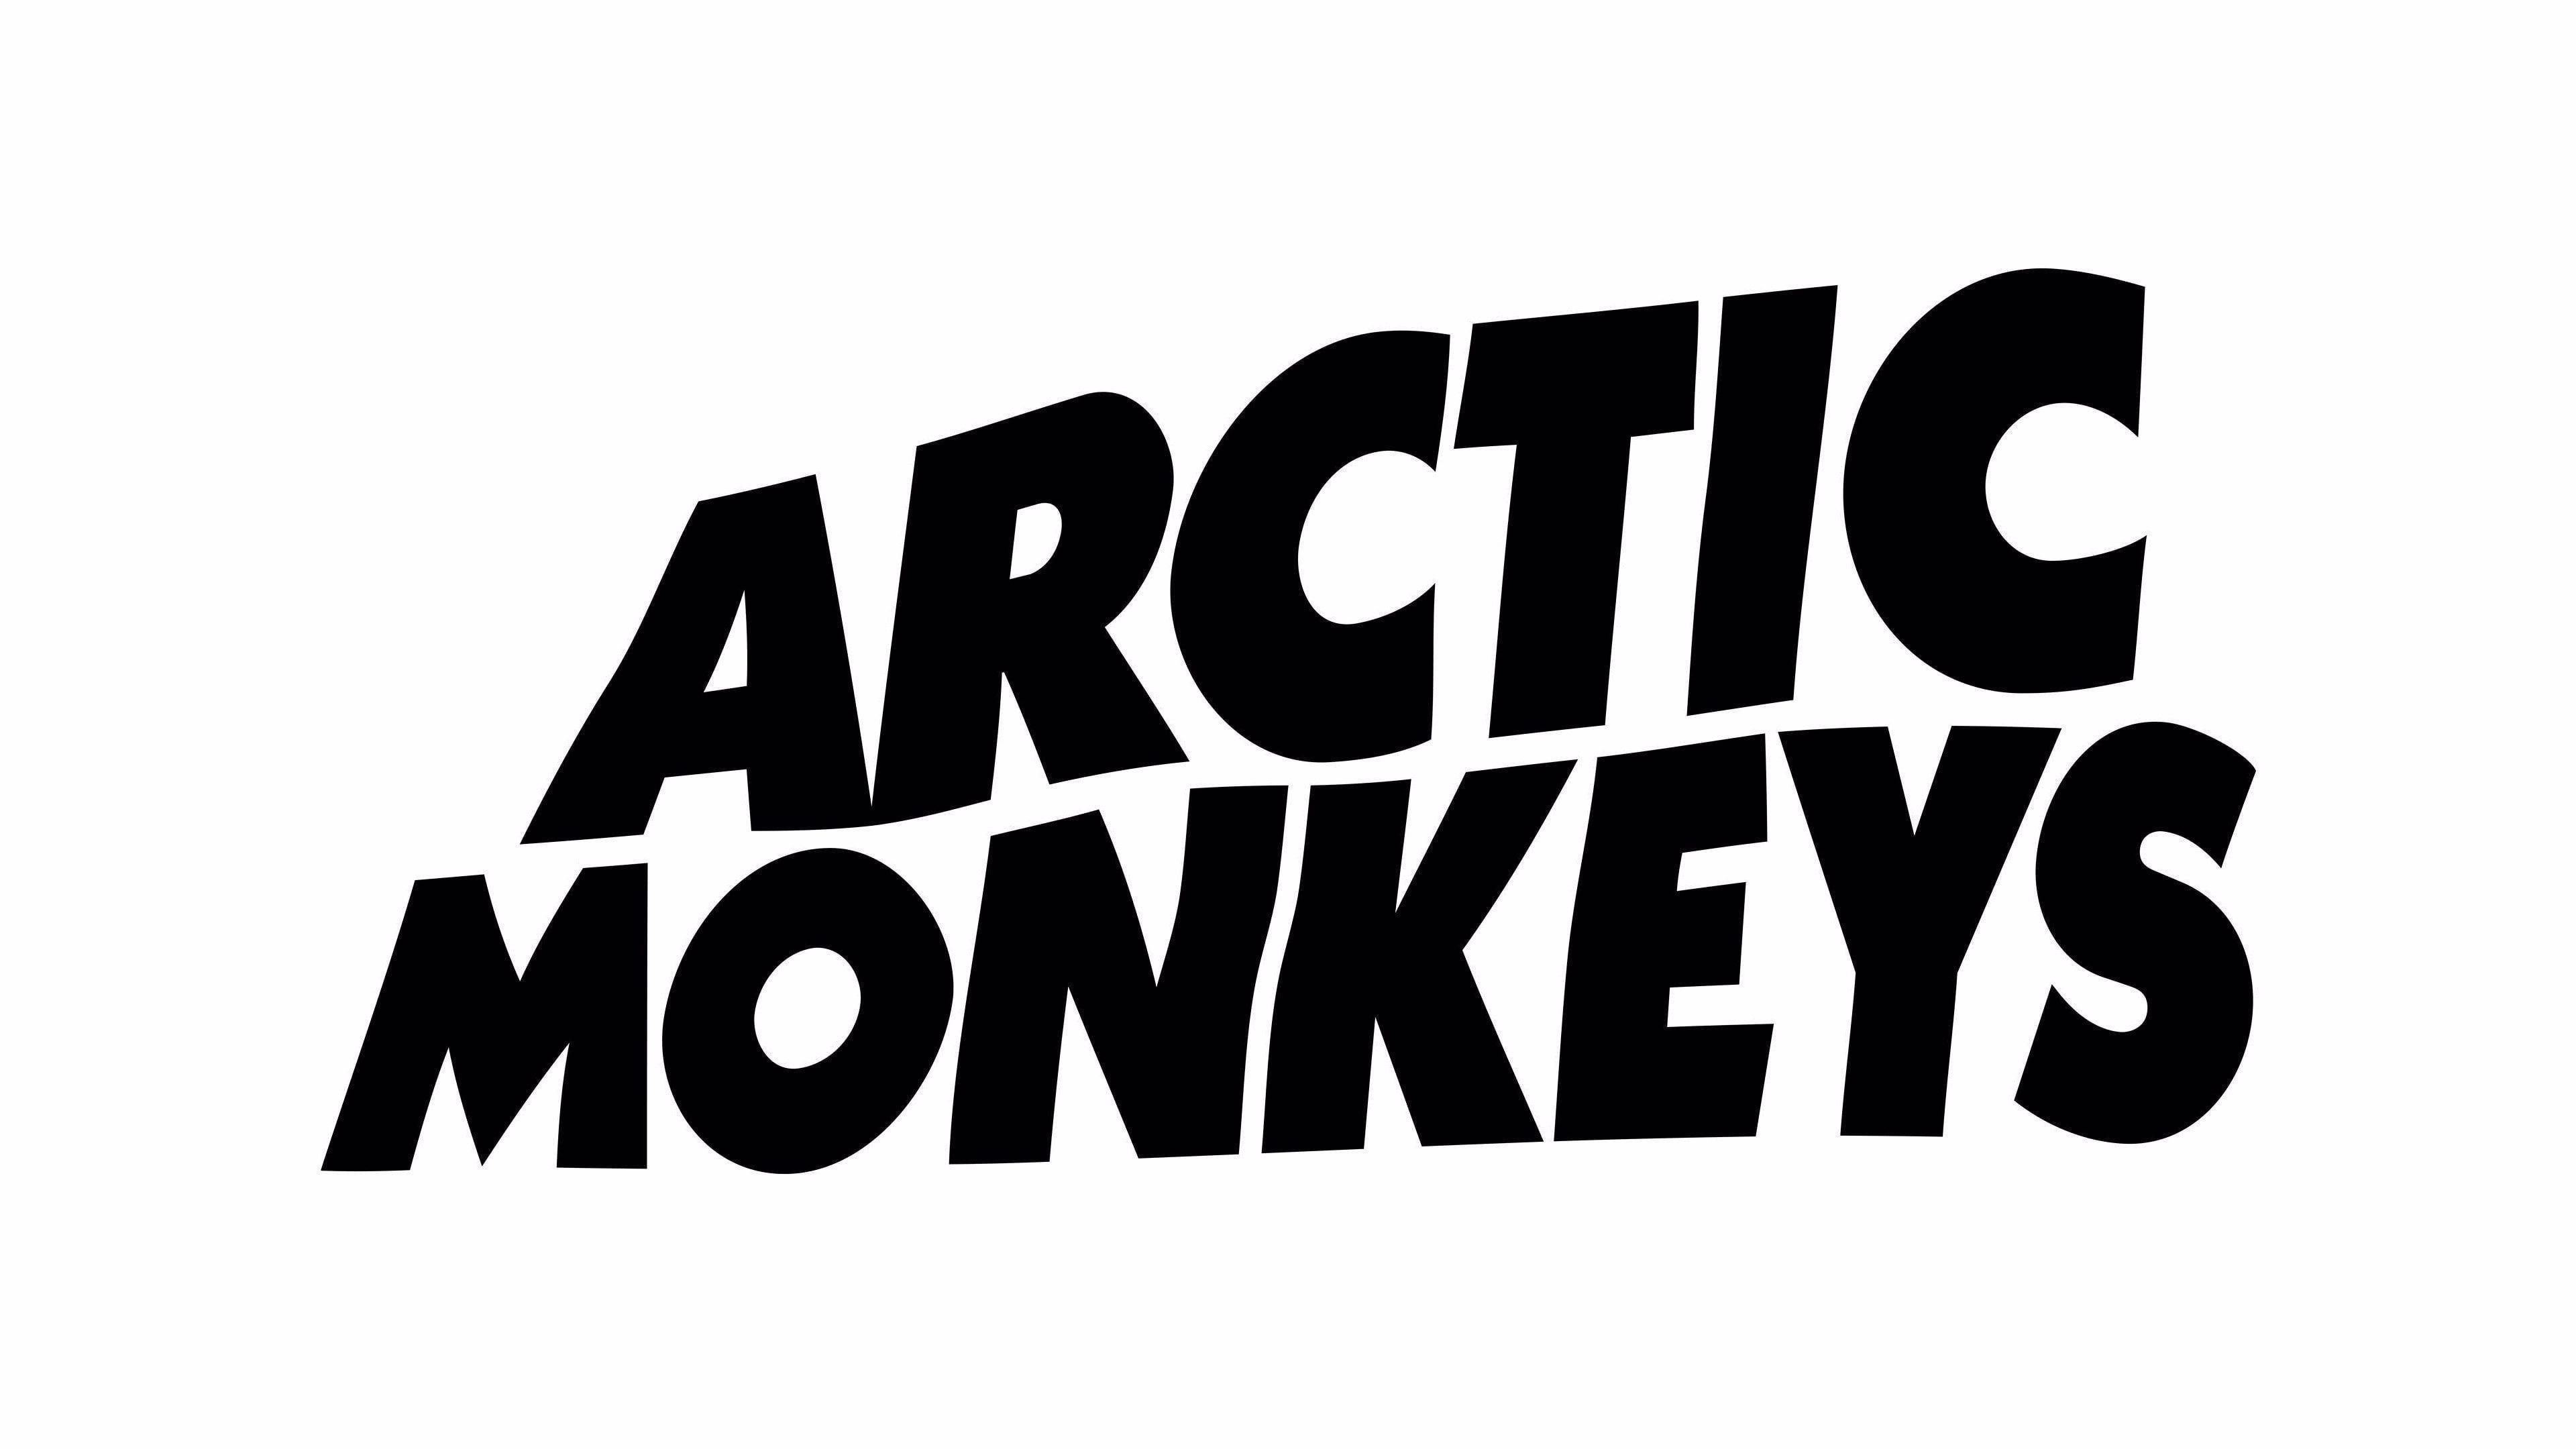 Image Result For Arctic Monkeys Desktop Wallpaper Achados E Perdidos Planos De Fundo Papeis De Parede Para Iphone